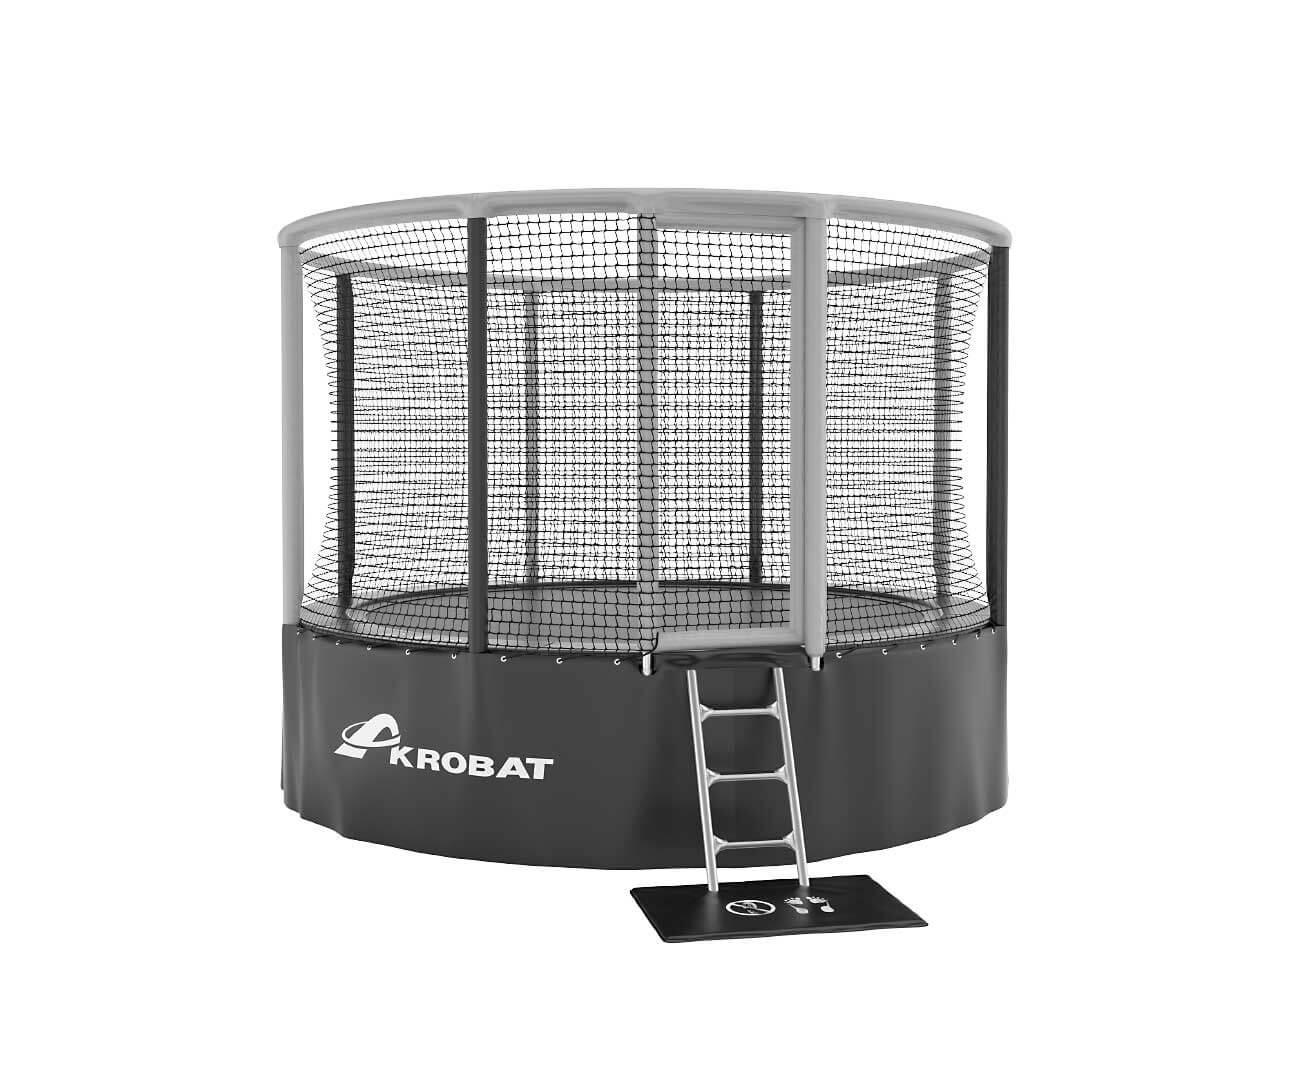 Akrobat Gallus 480 Grey-black enclosure /Black safety pad/ Grey jumping mat